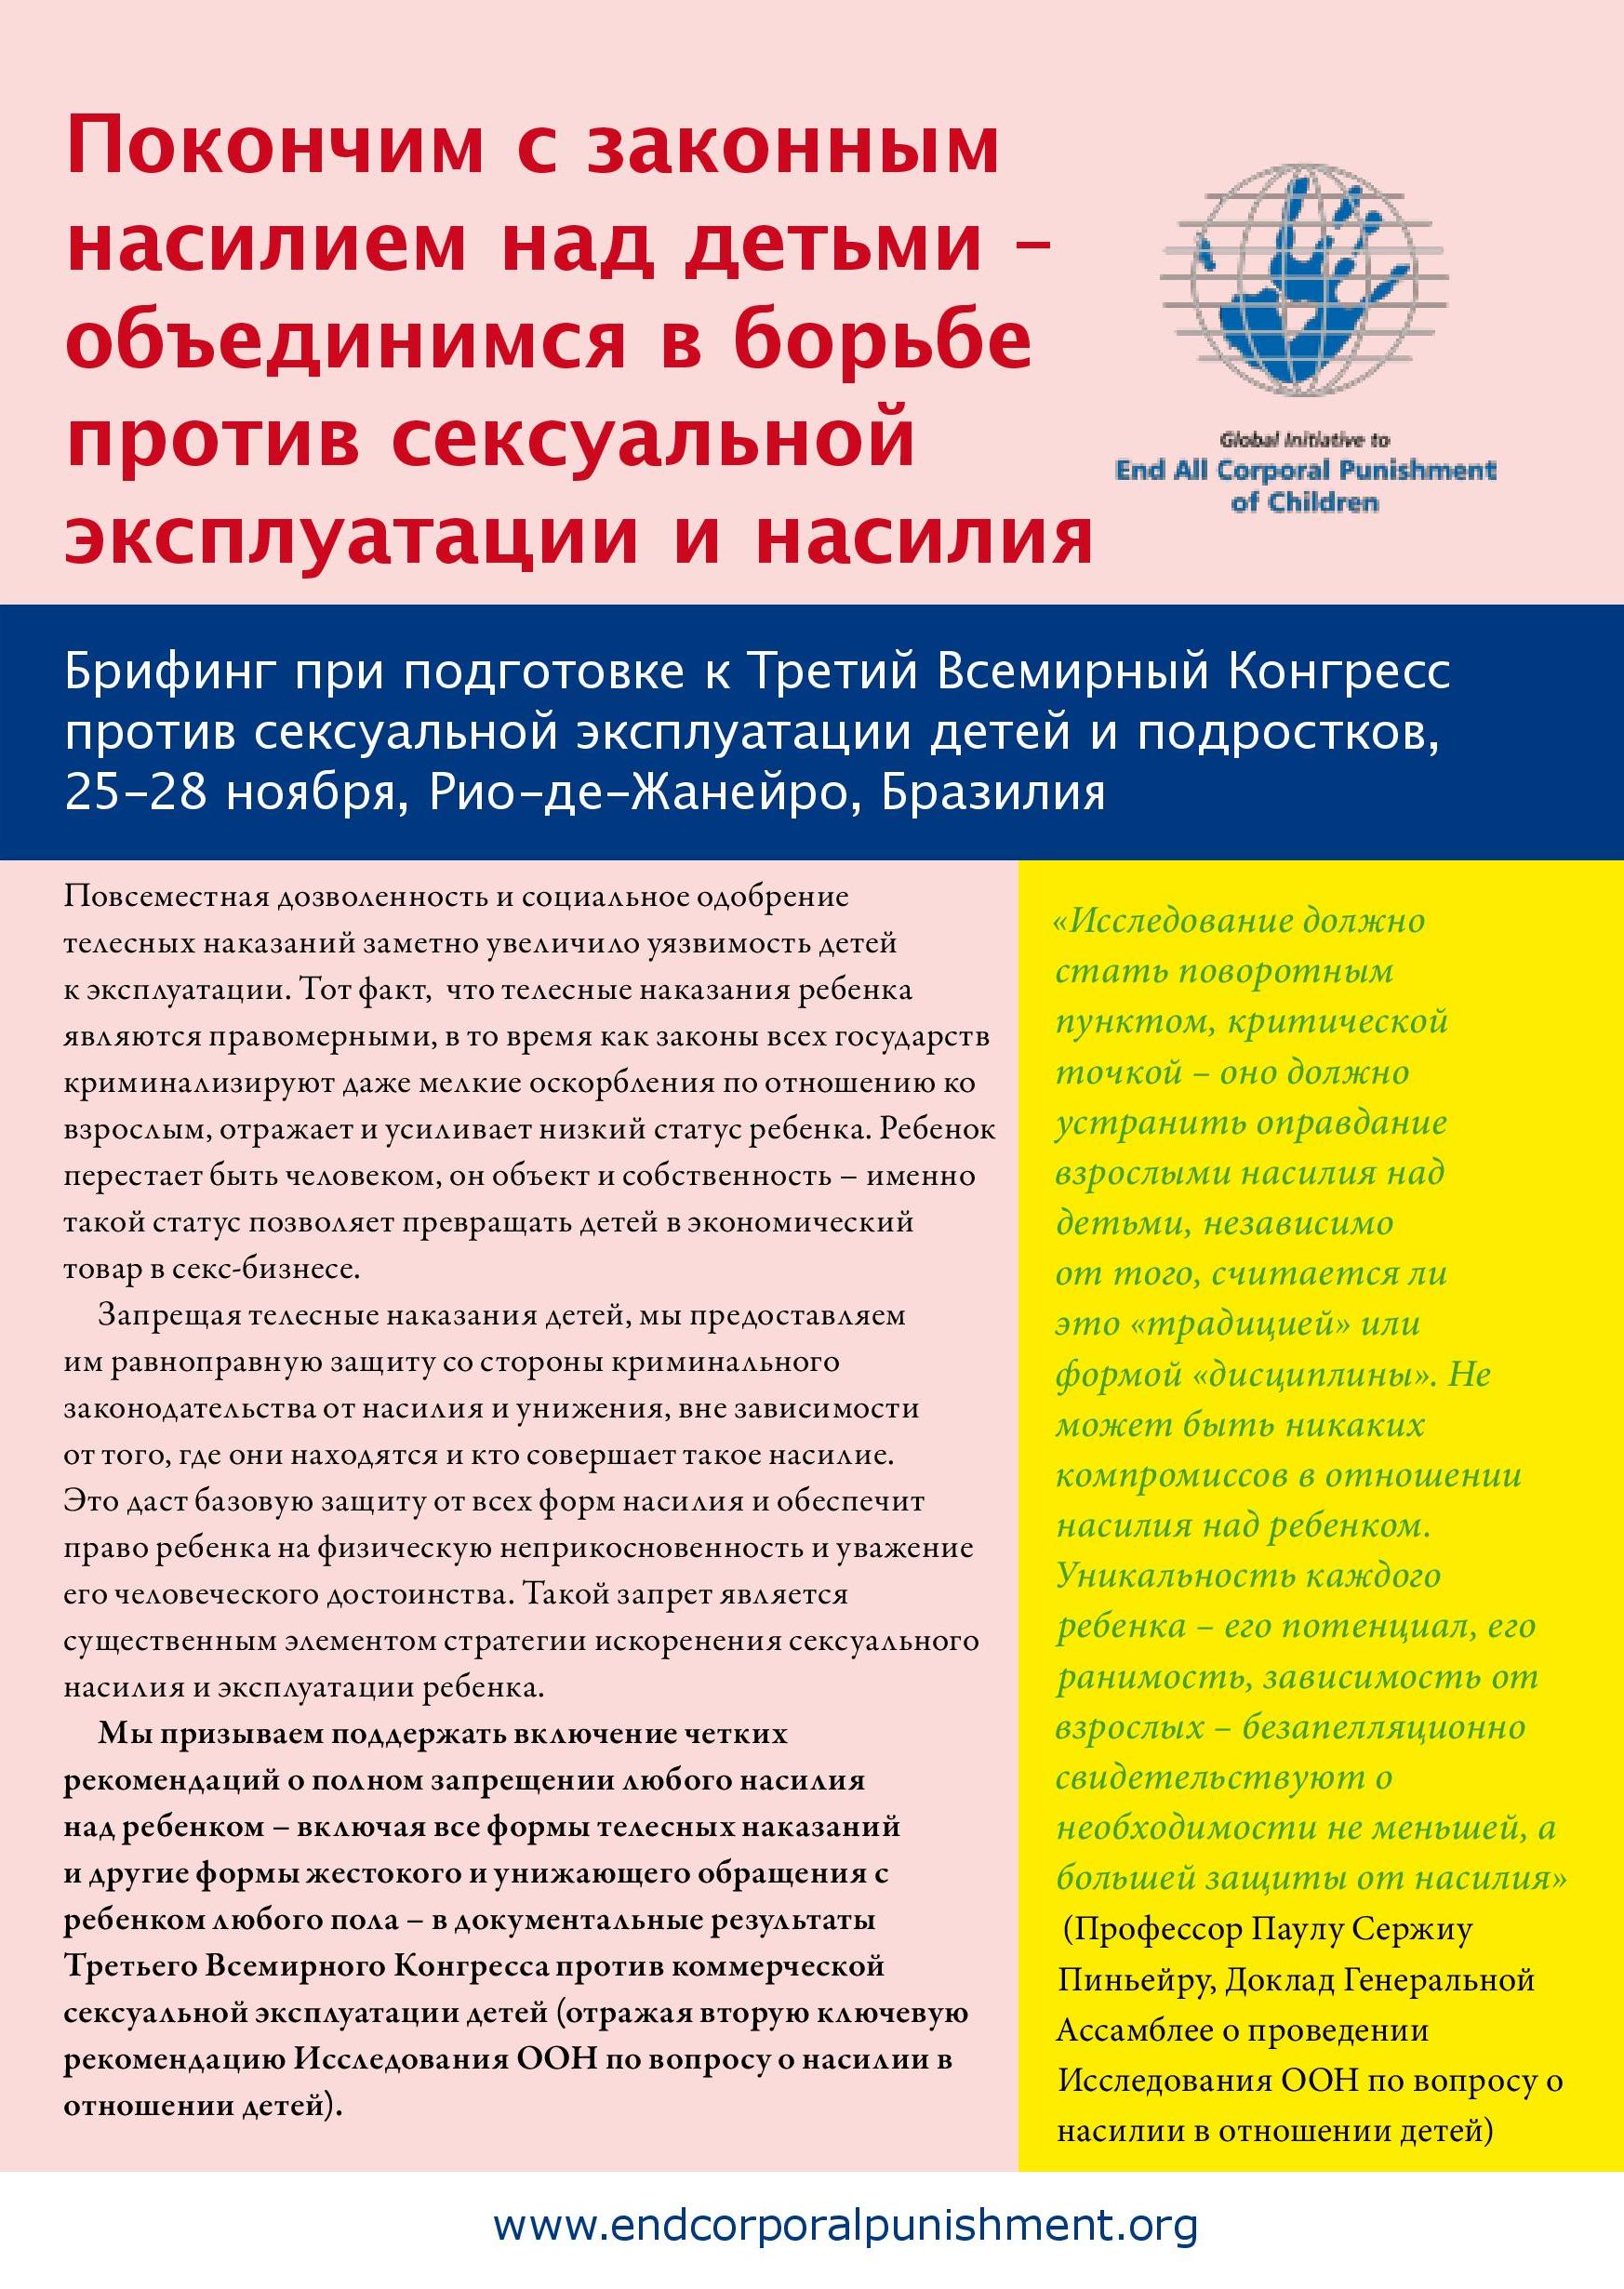 Sexual-exploitation-briefing-2008-RU-cover